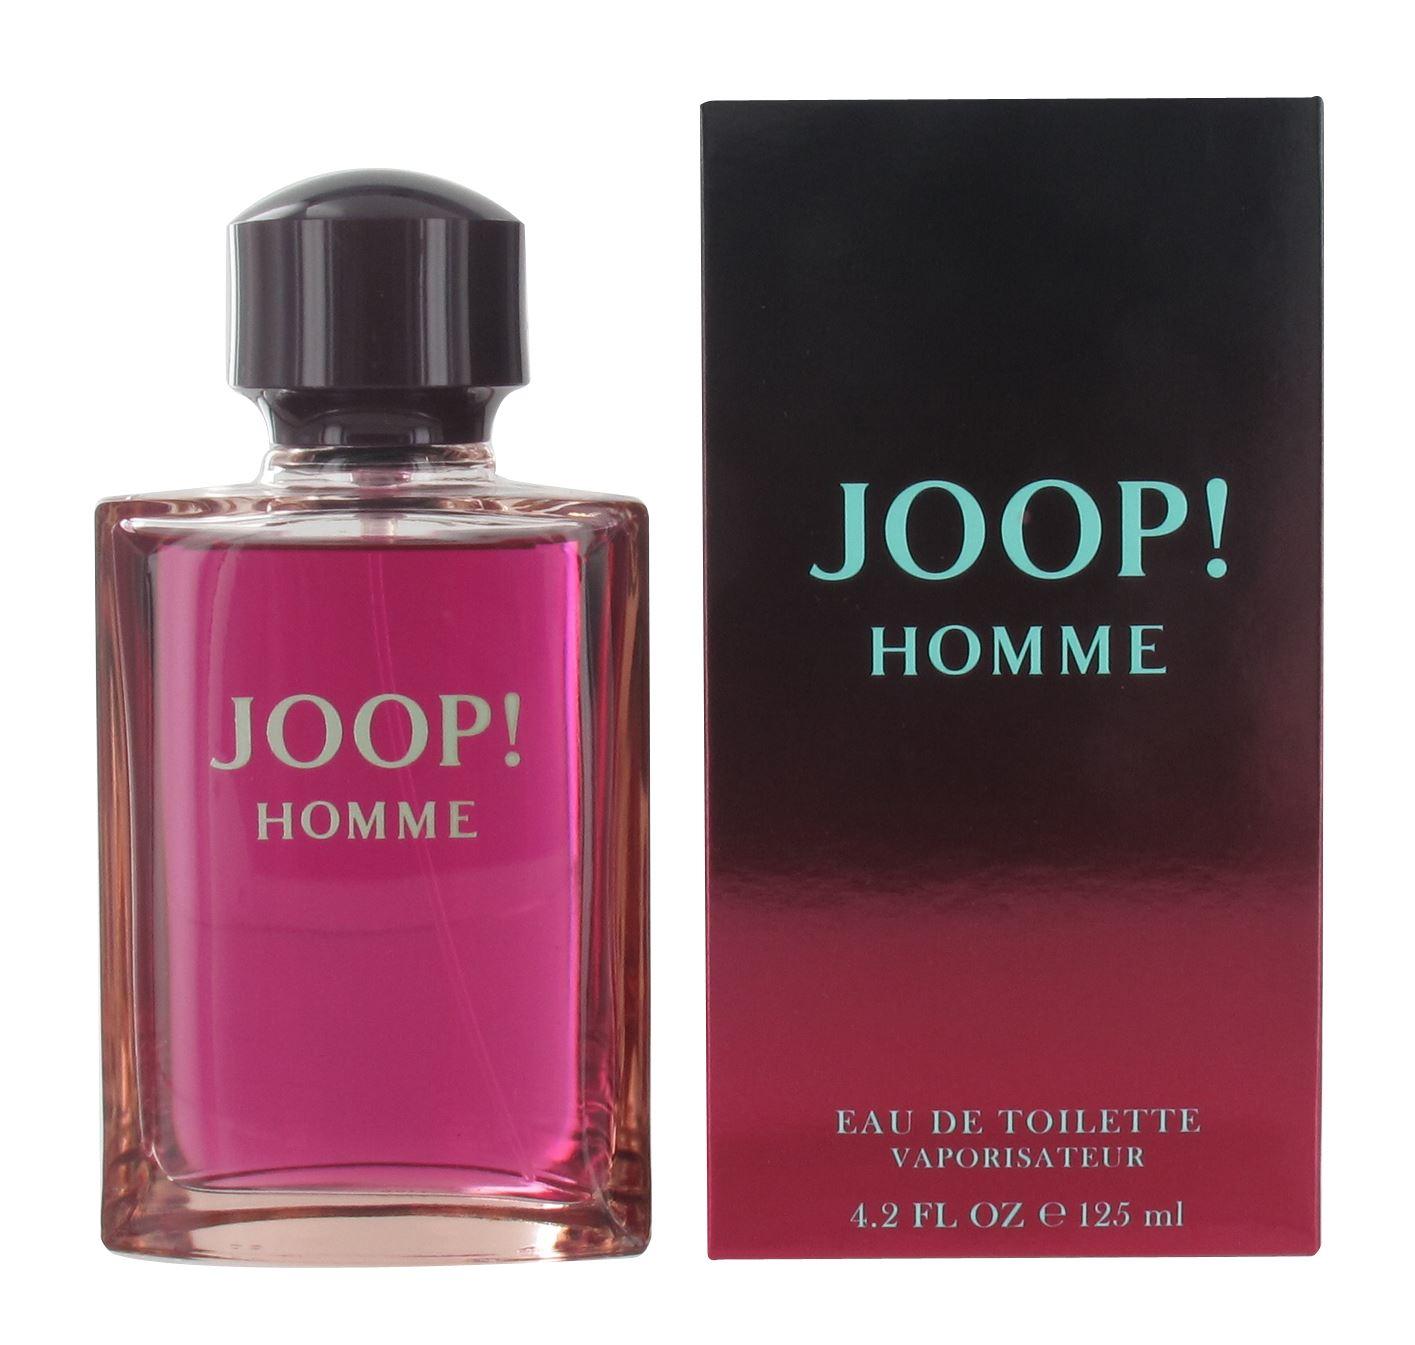 joop homme 125ml eau de toilette spray for men new ebay. Black Bedroom Furniture Sets. Home Design Ideas